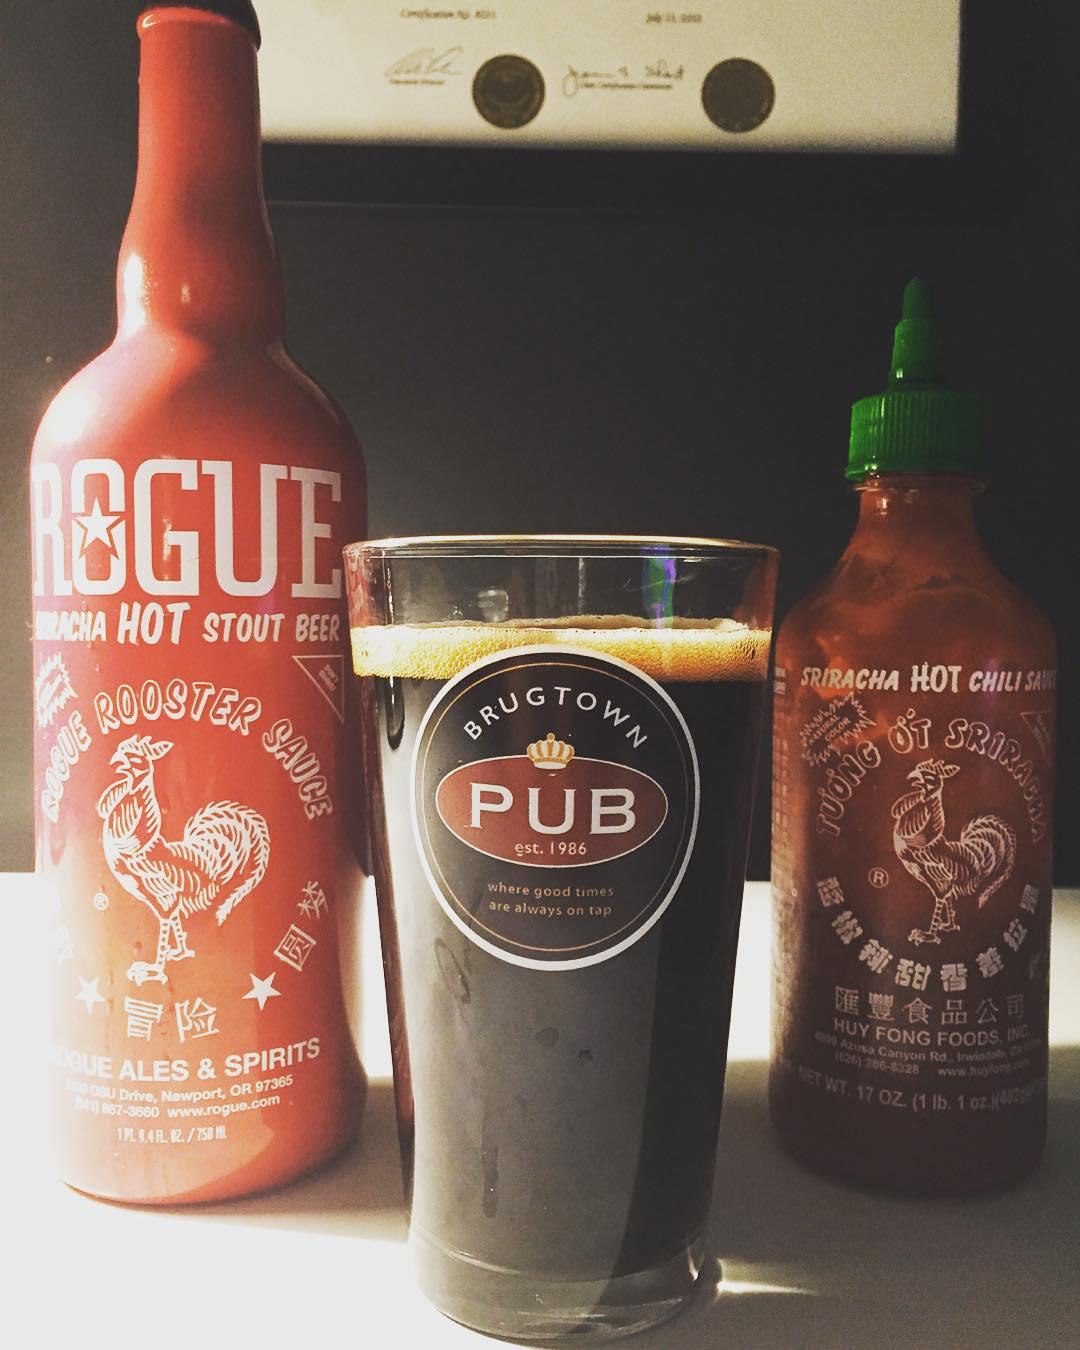 REVIEW: Rogue Sriracha Hot Stout - Junk Banter